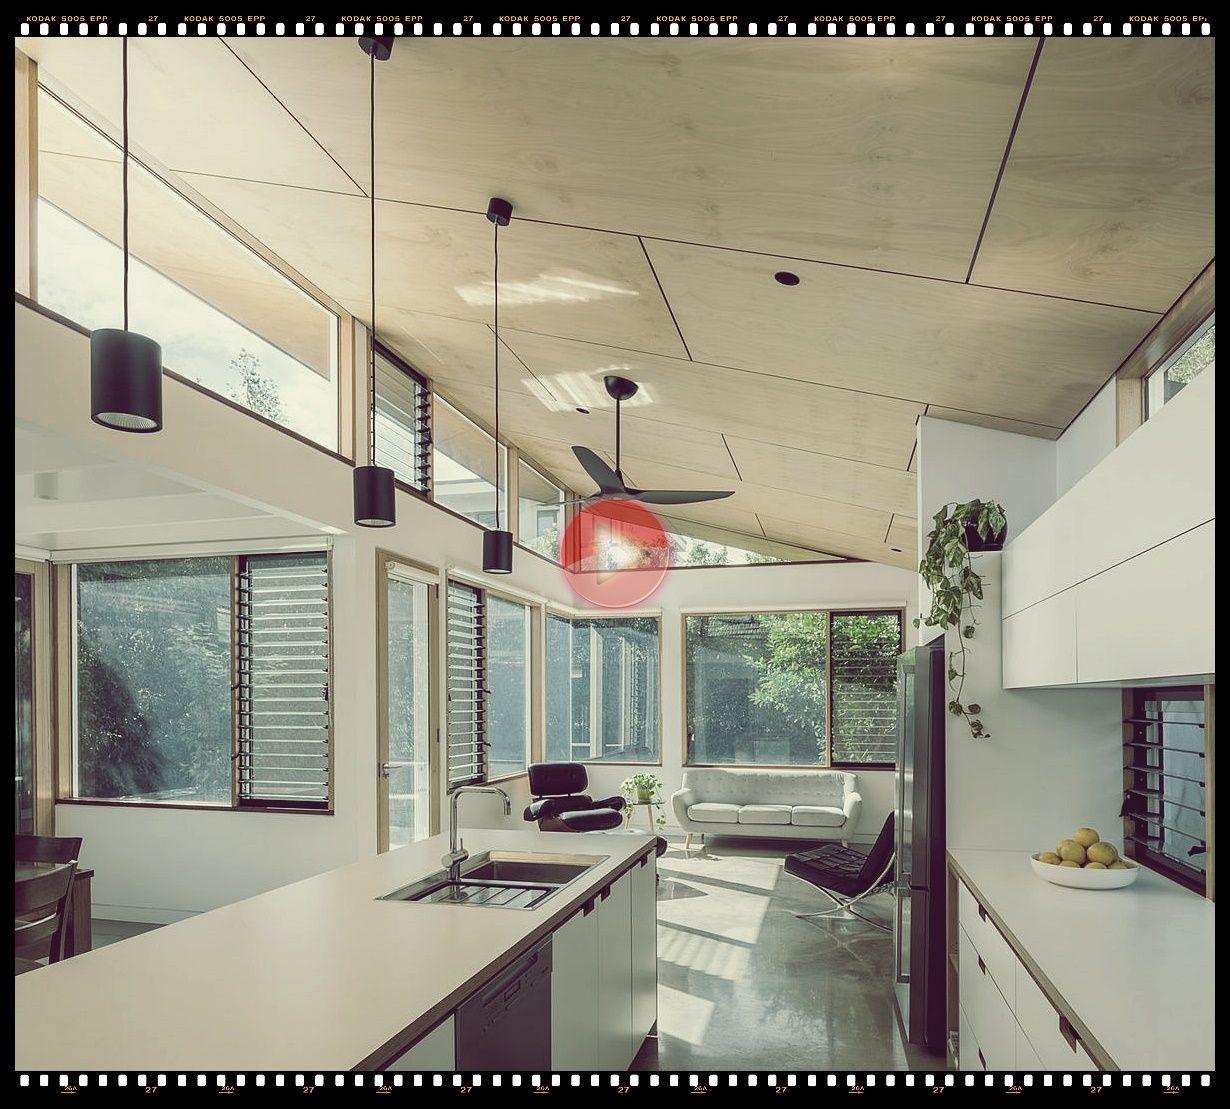 clerestory roof images Roof design, Design, Roof